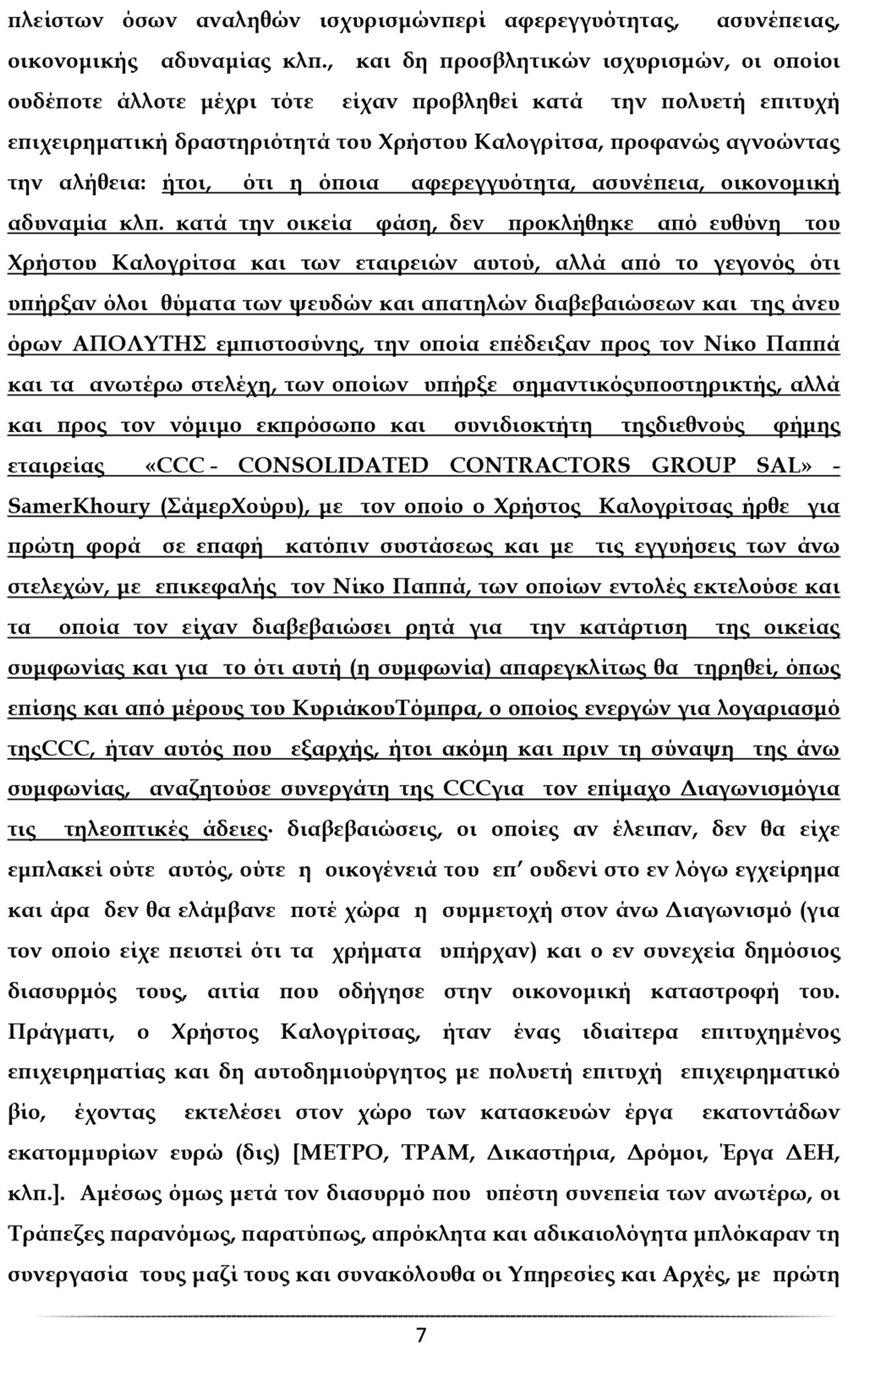 ypomnima-7